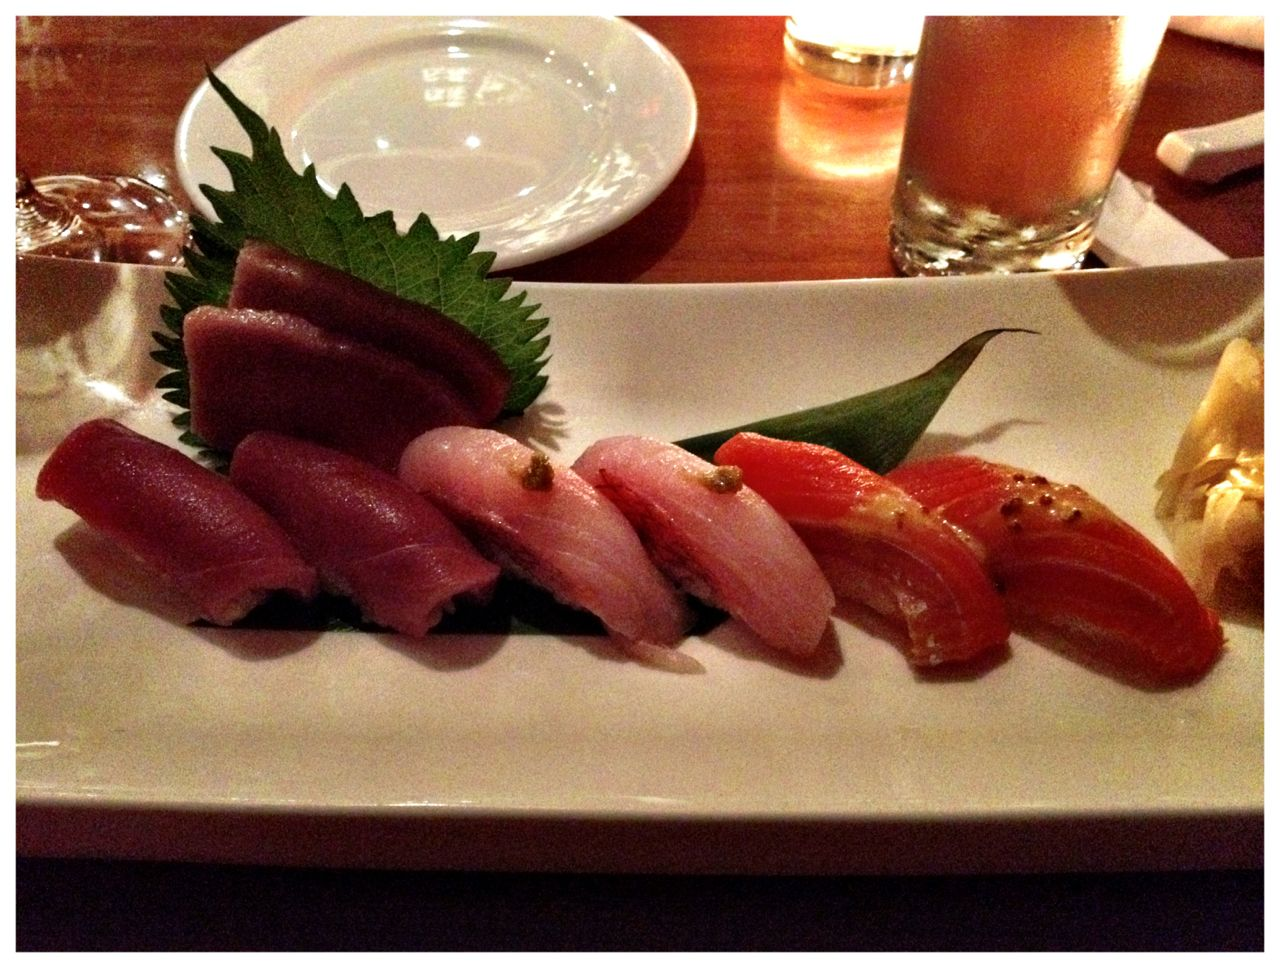 Toro, bluefin, sockeye salmon, kinme dai (wild golden eye snapper), dinner tonight.